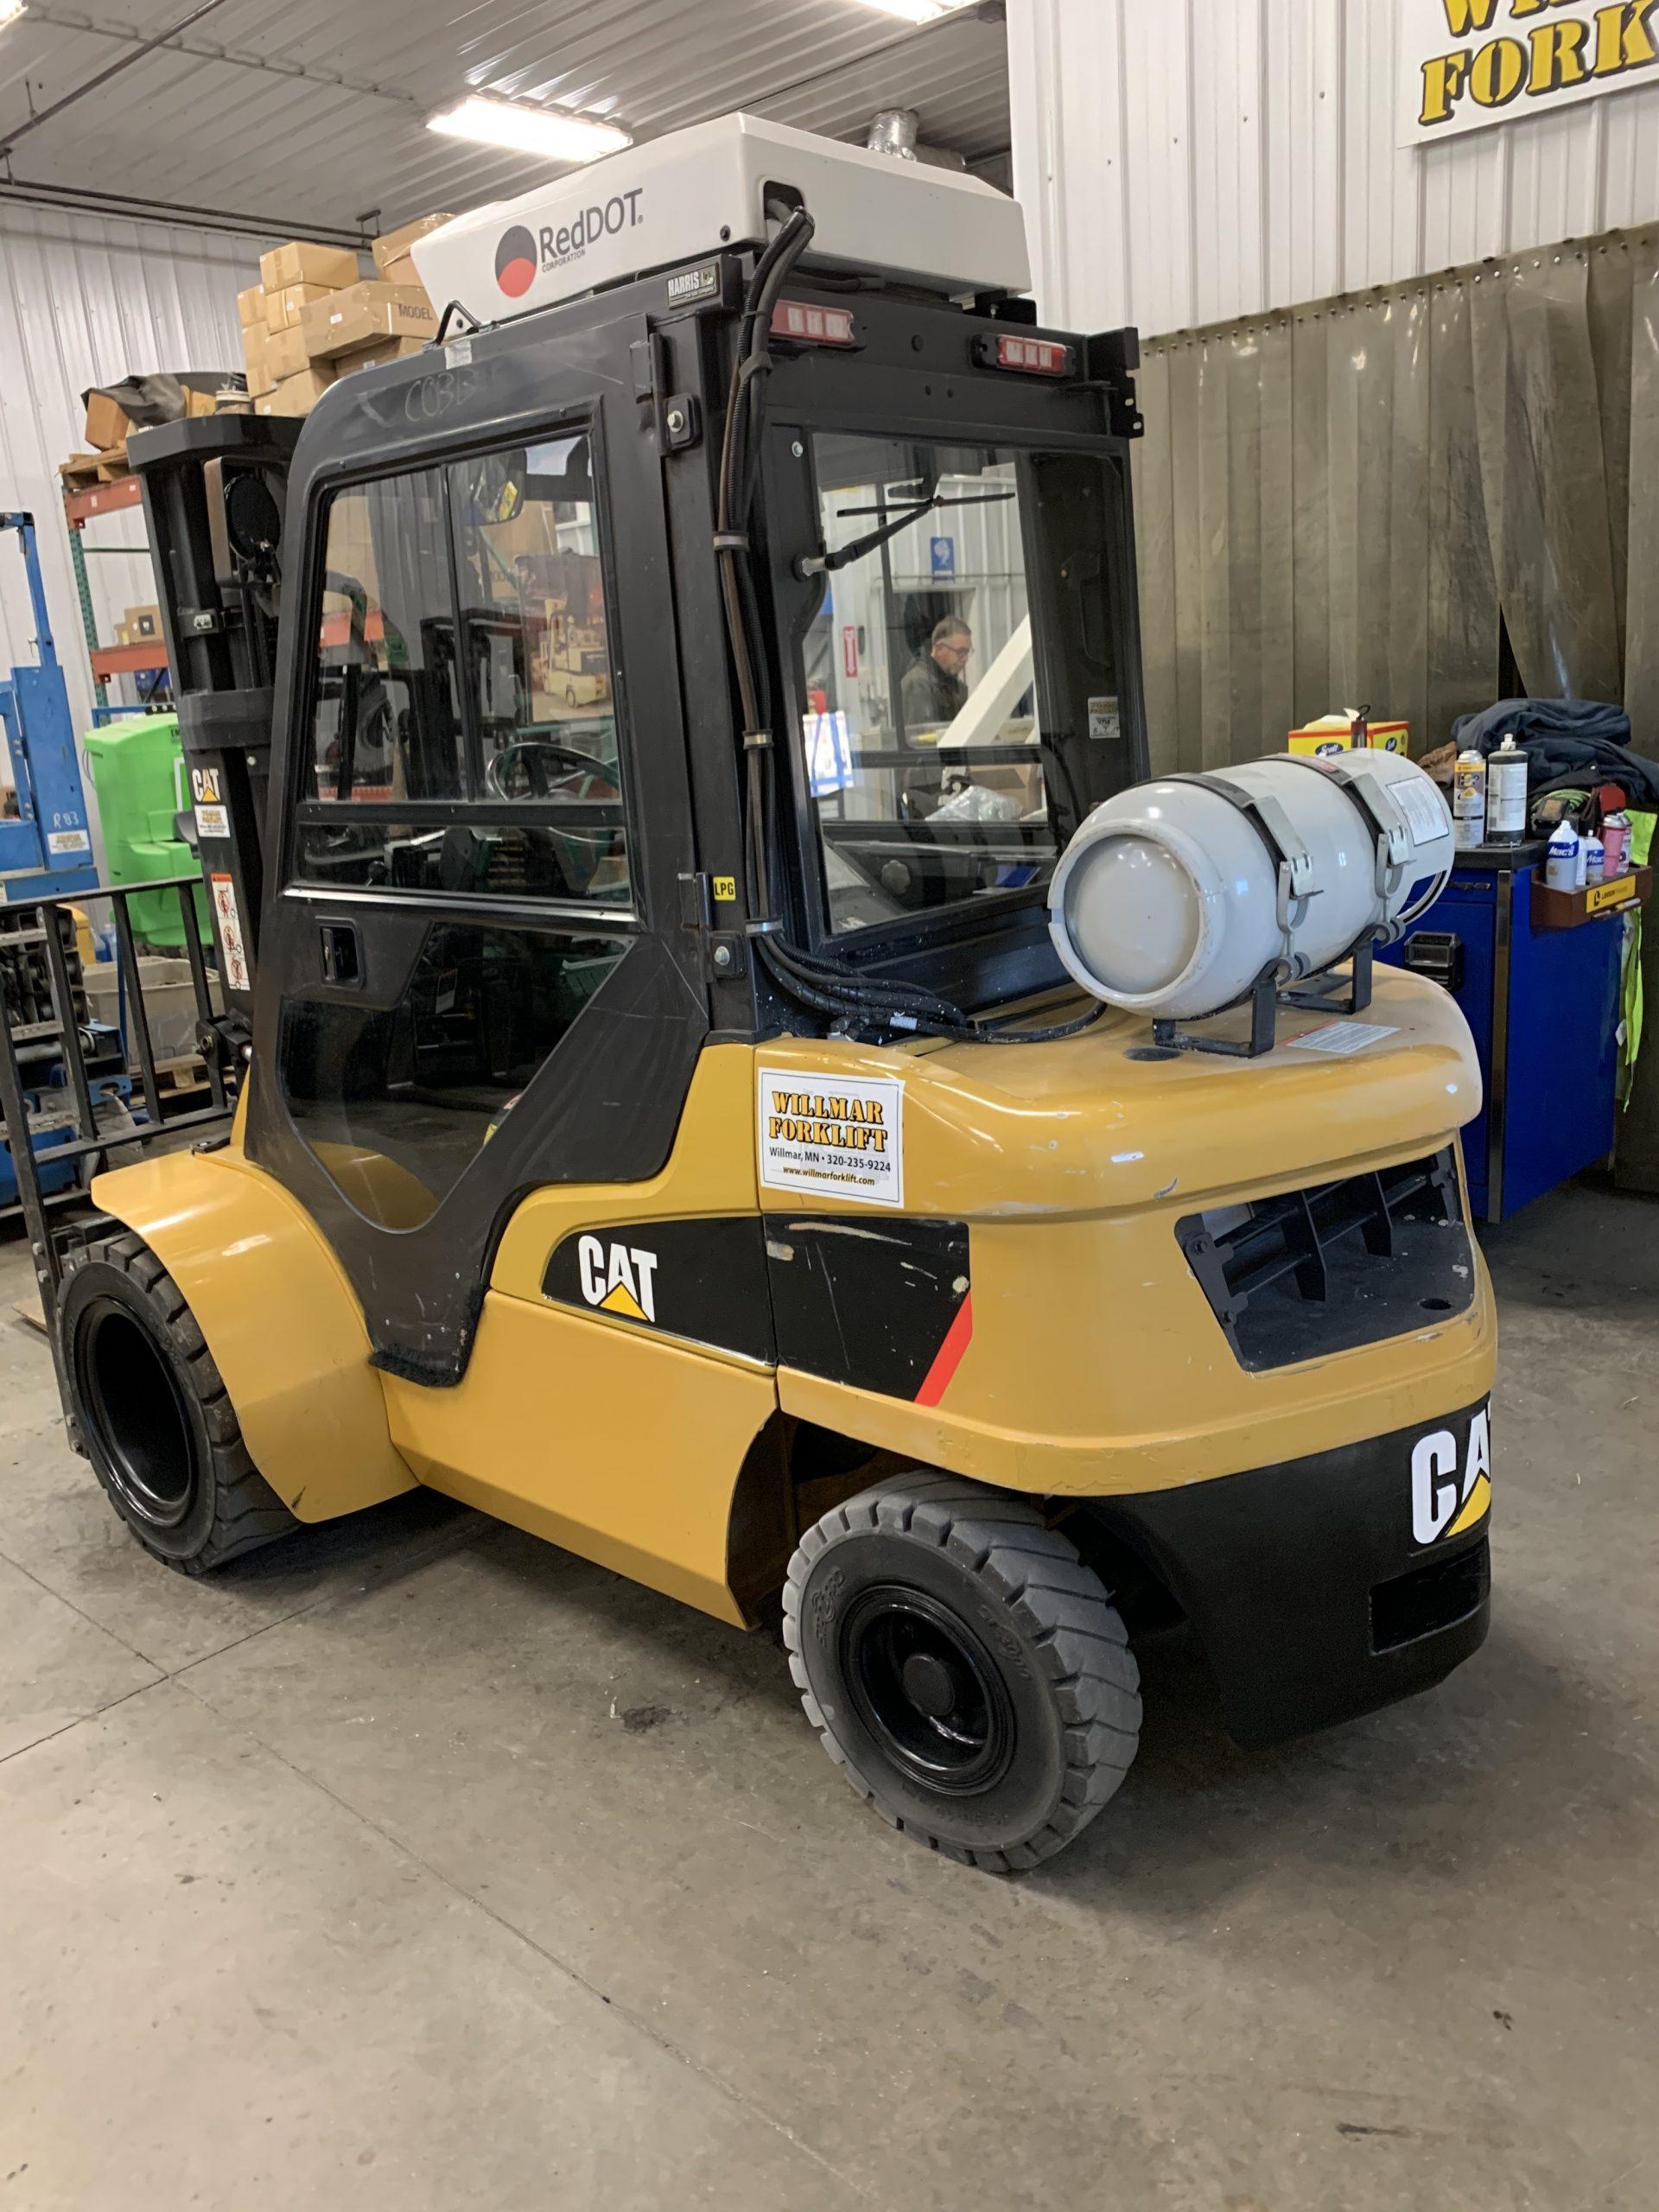 Caterpillar Forklift C0313 (1)